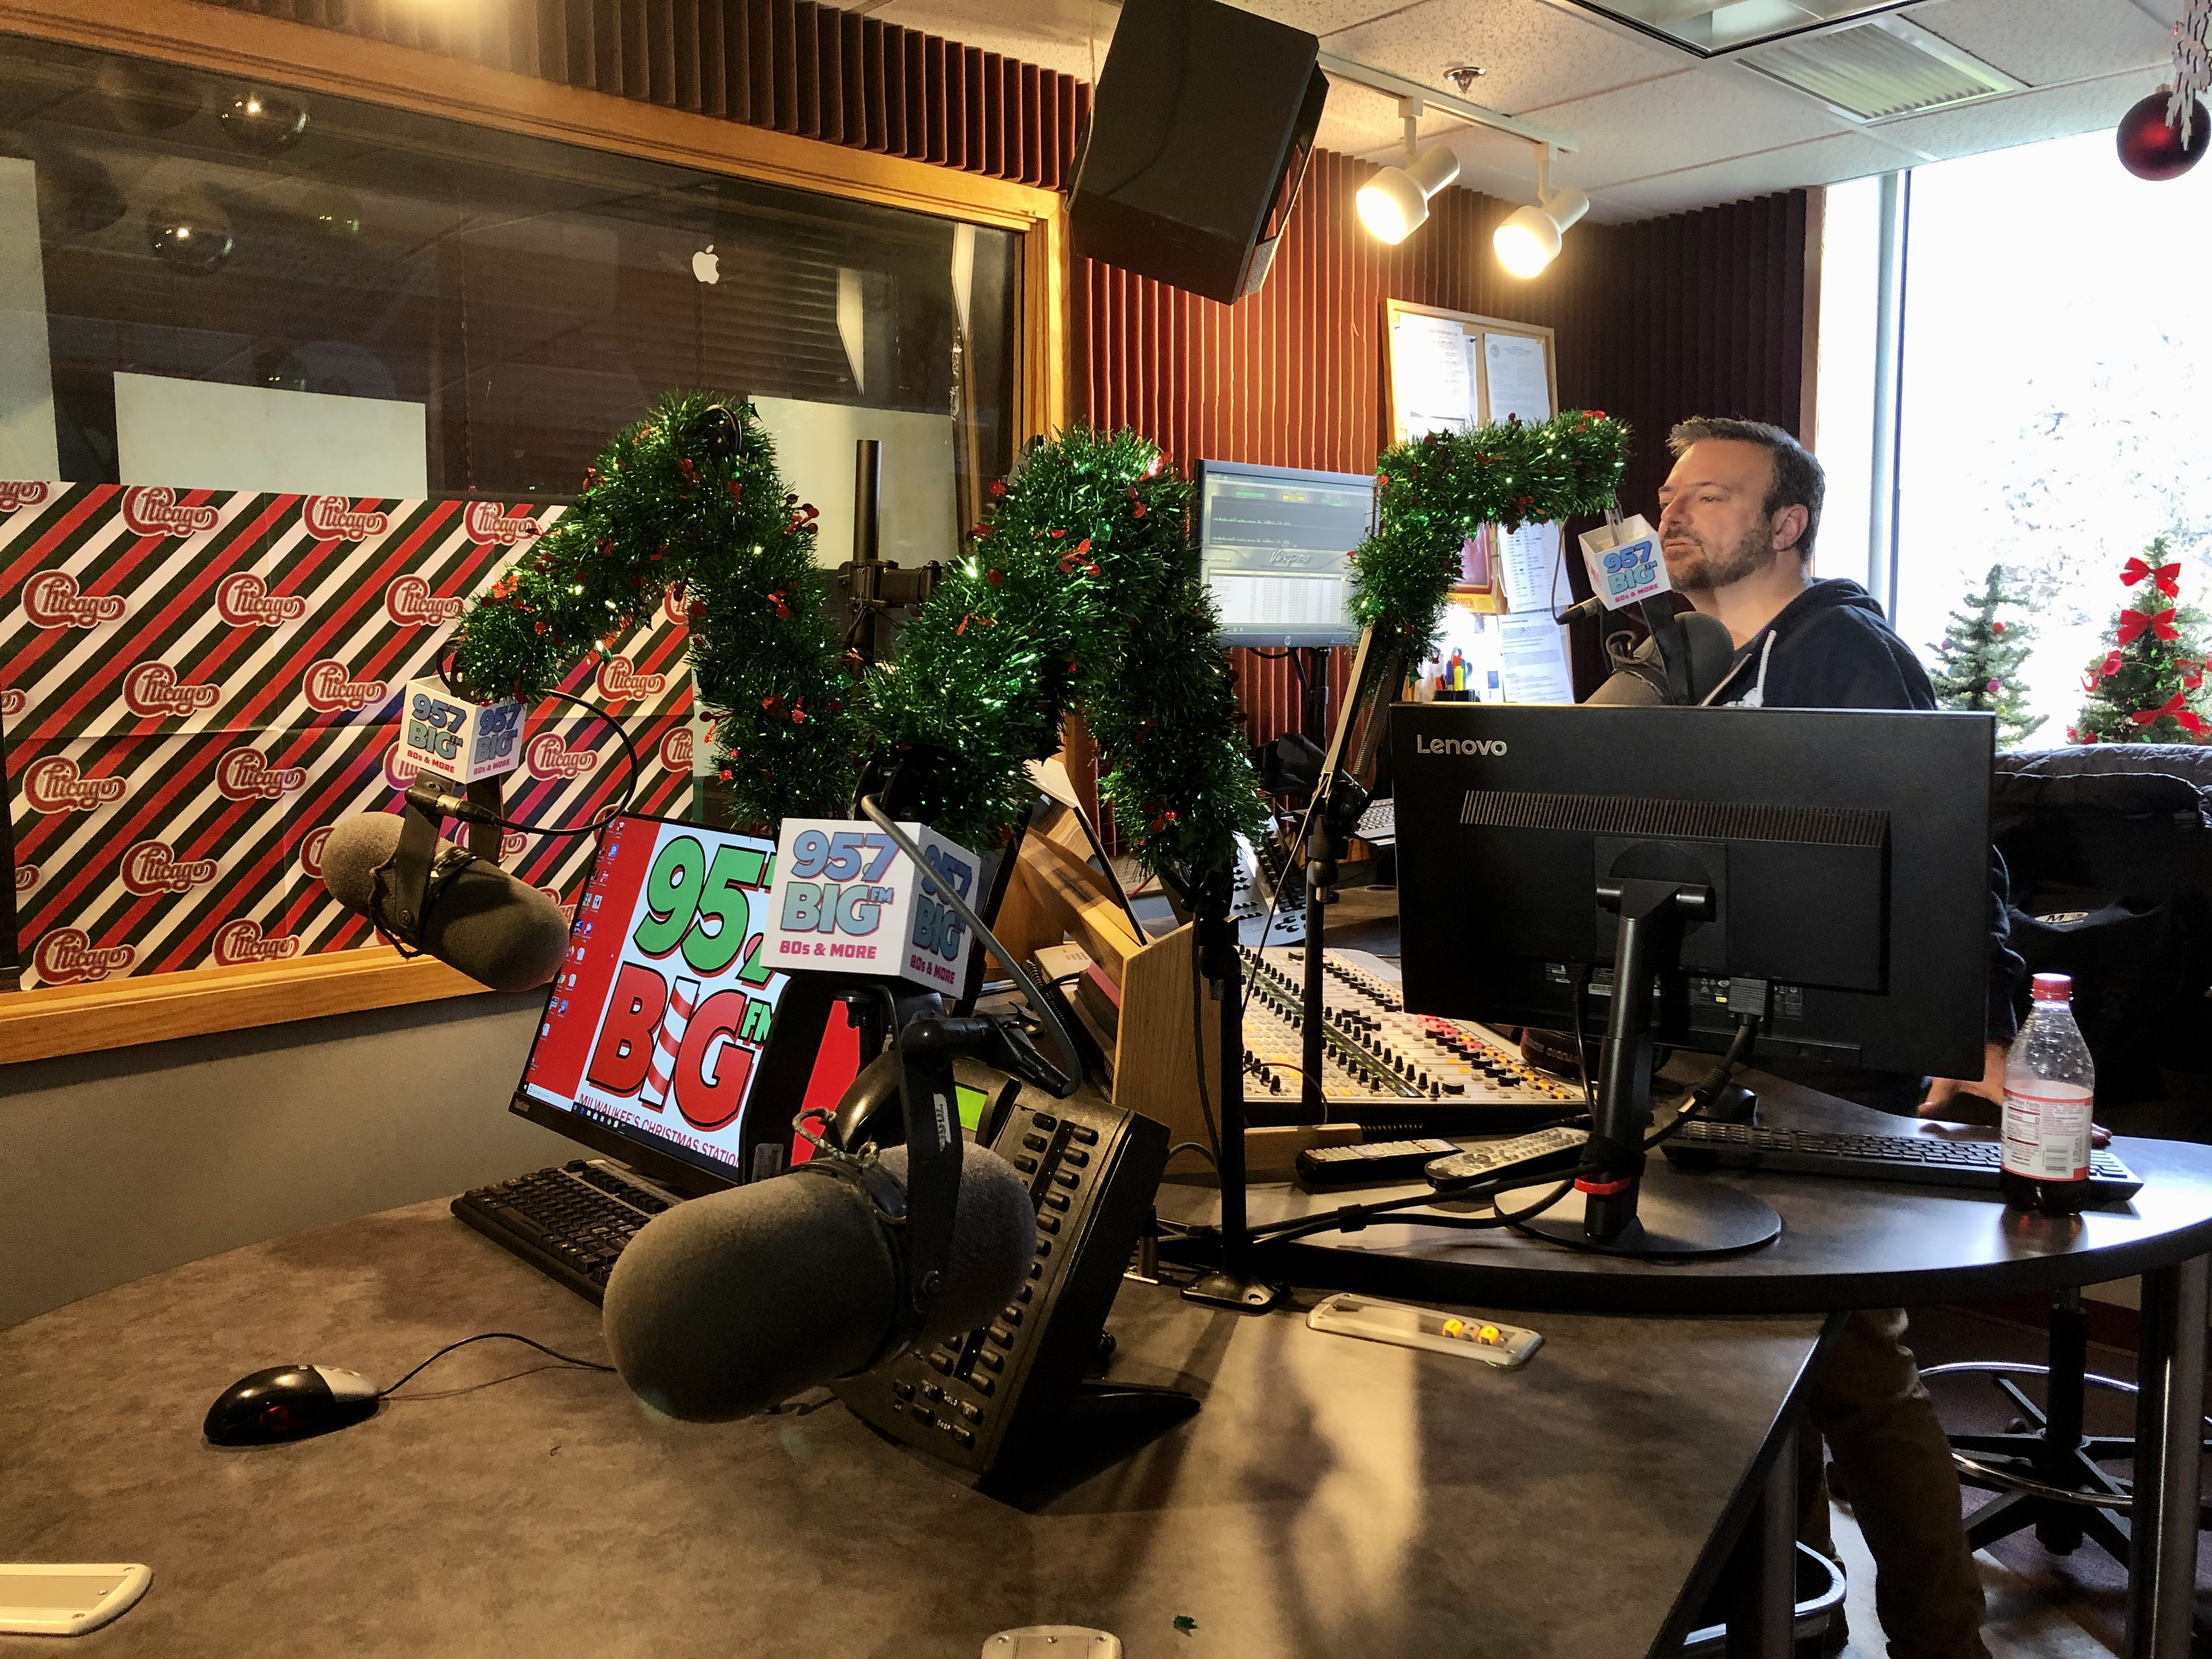 Local radio station begins playing